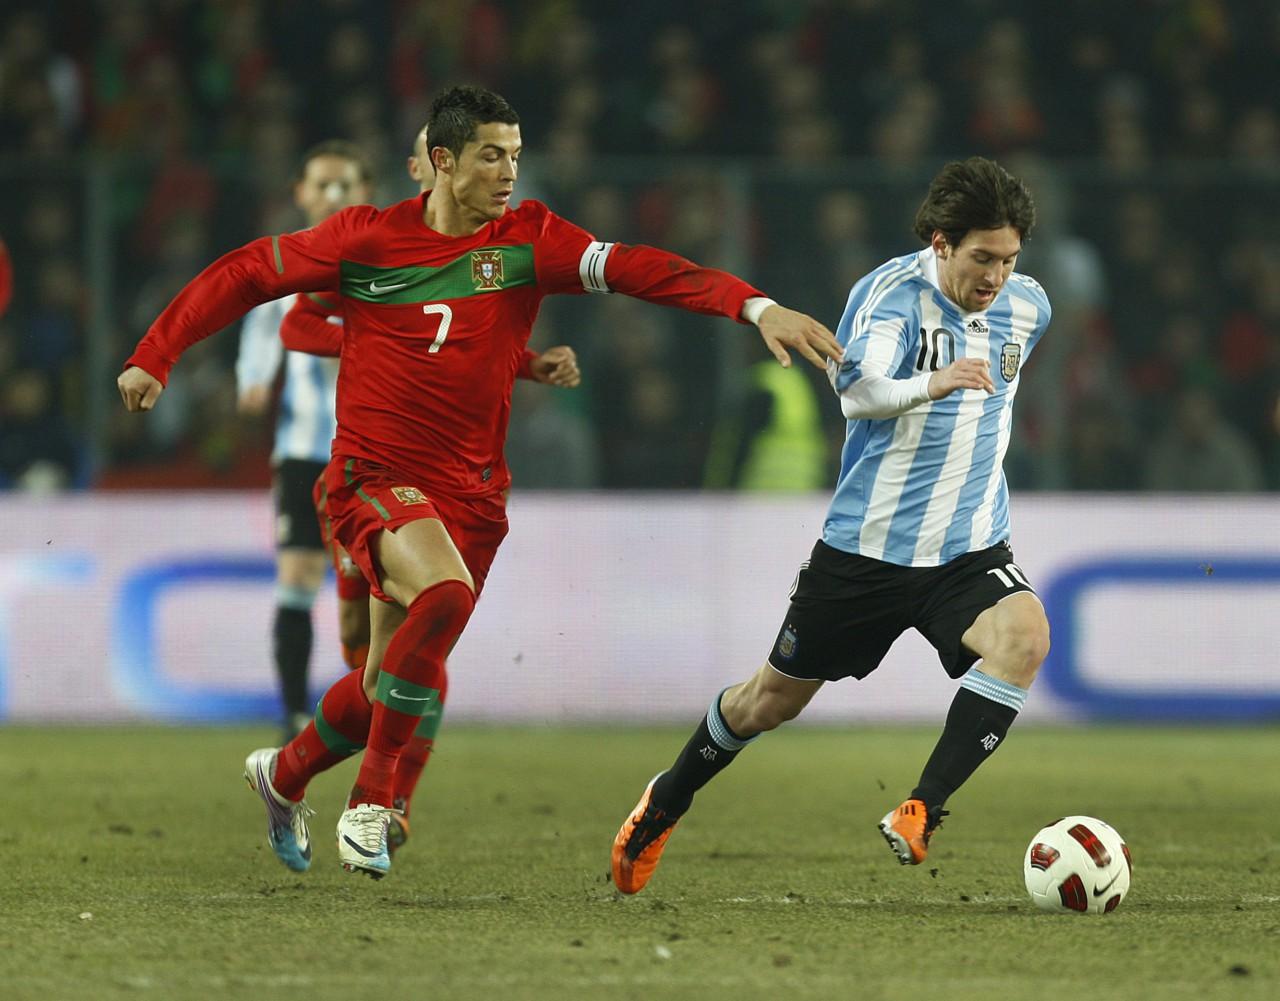 Portugal 1 x 2 Argentina - Ben Radford/Corbis via Getty Images